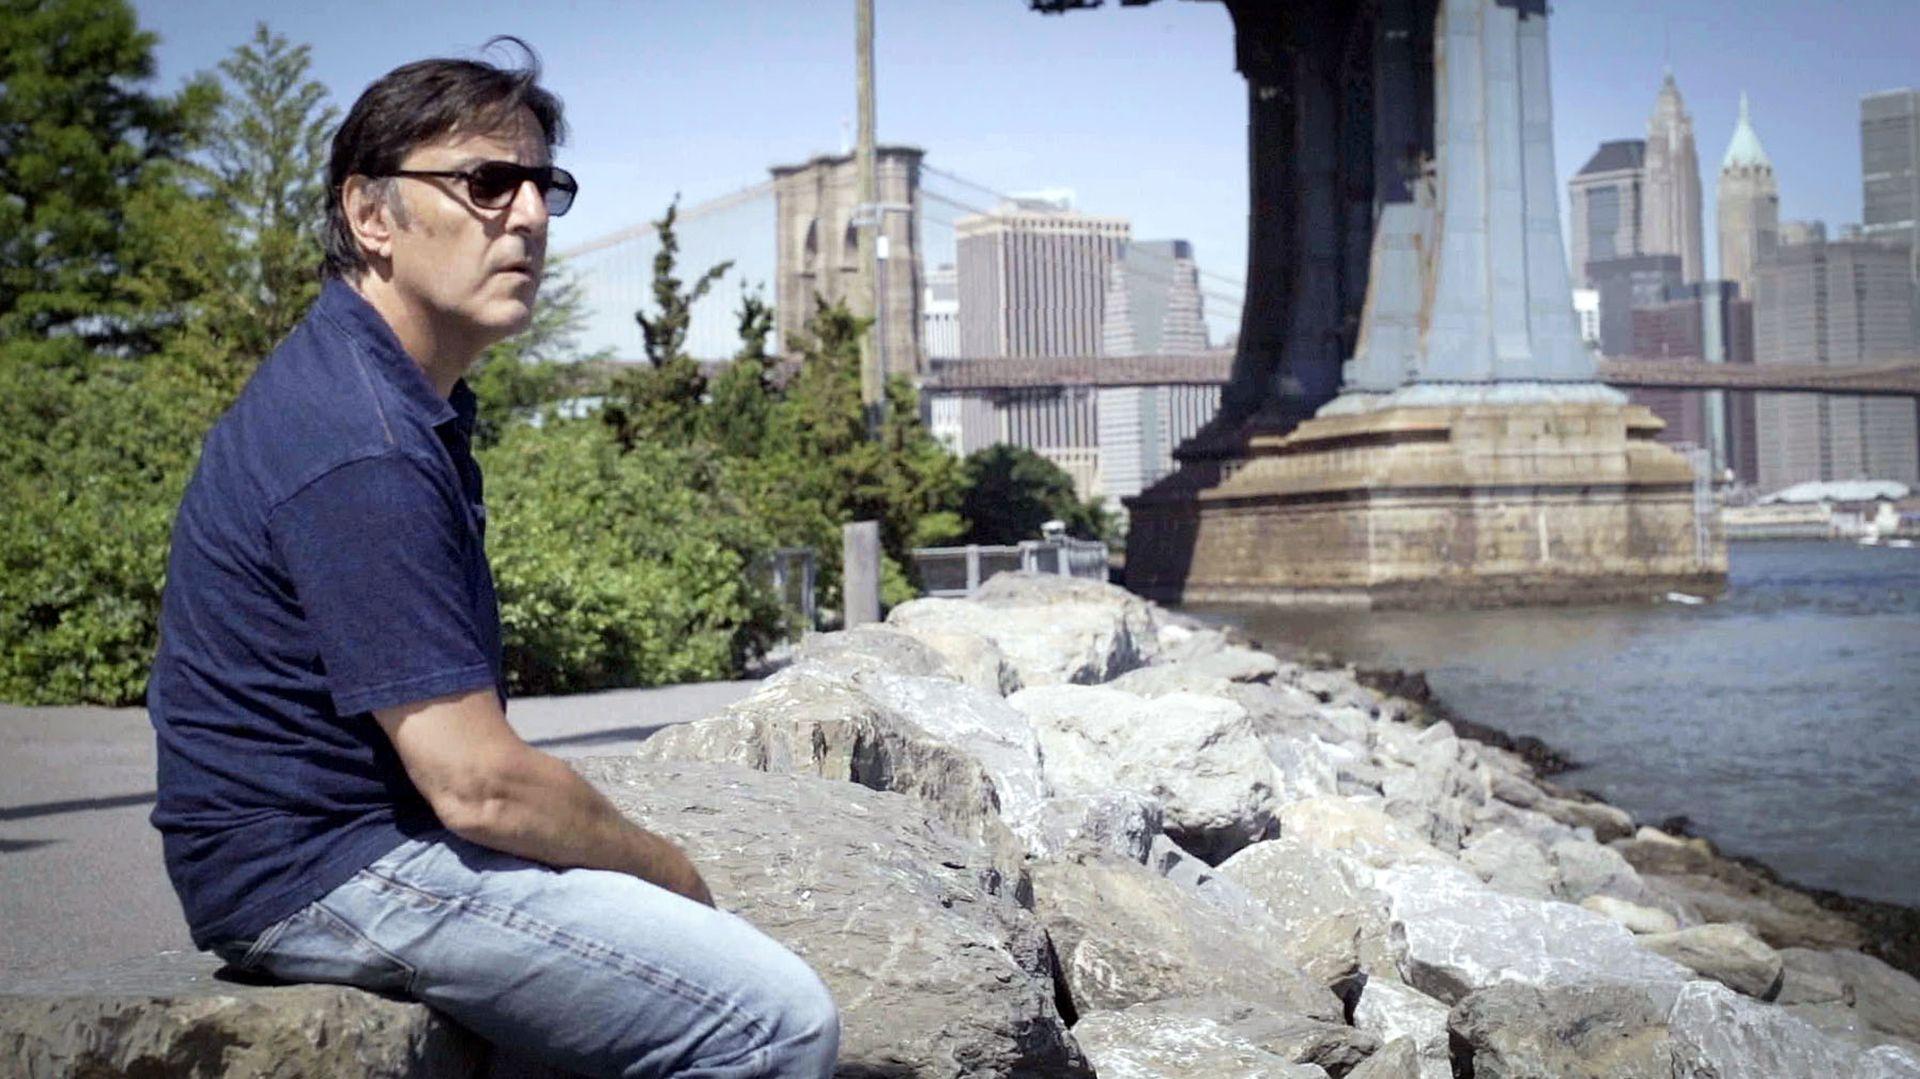 CINEMA PAR Yvan Attal le 29/10 sur CANAL+